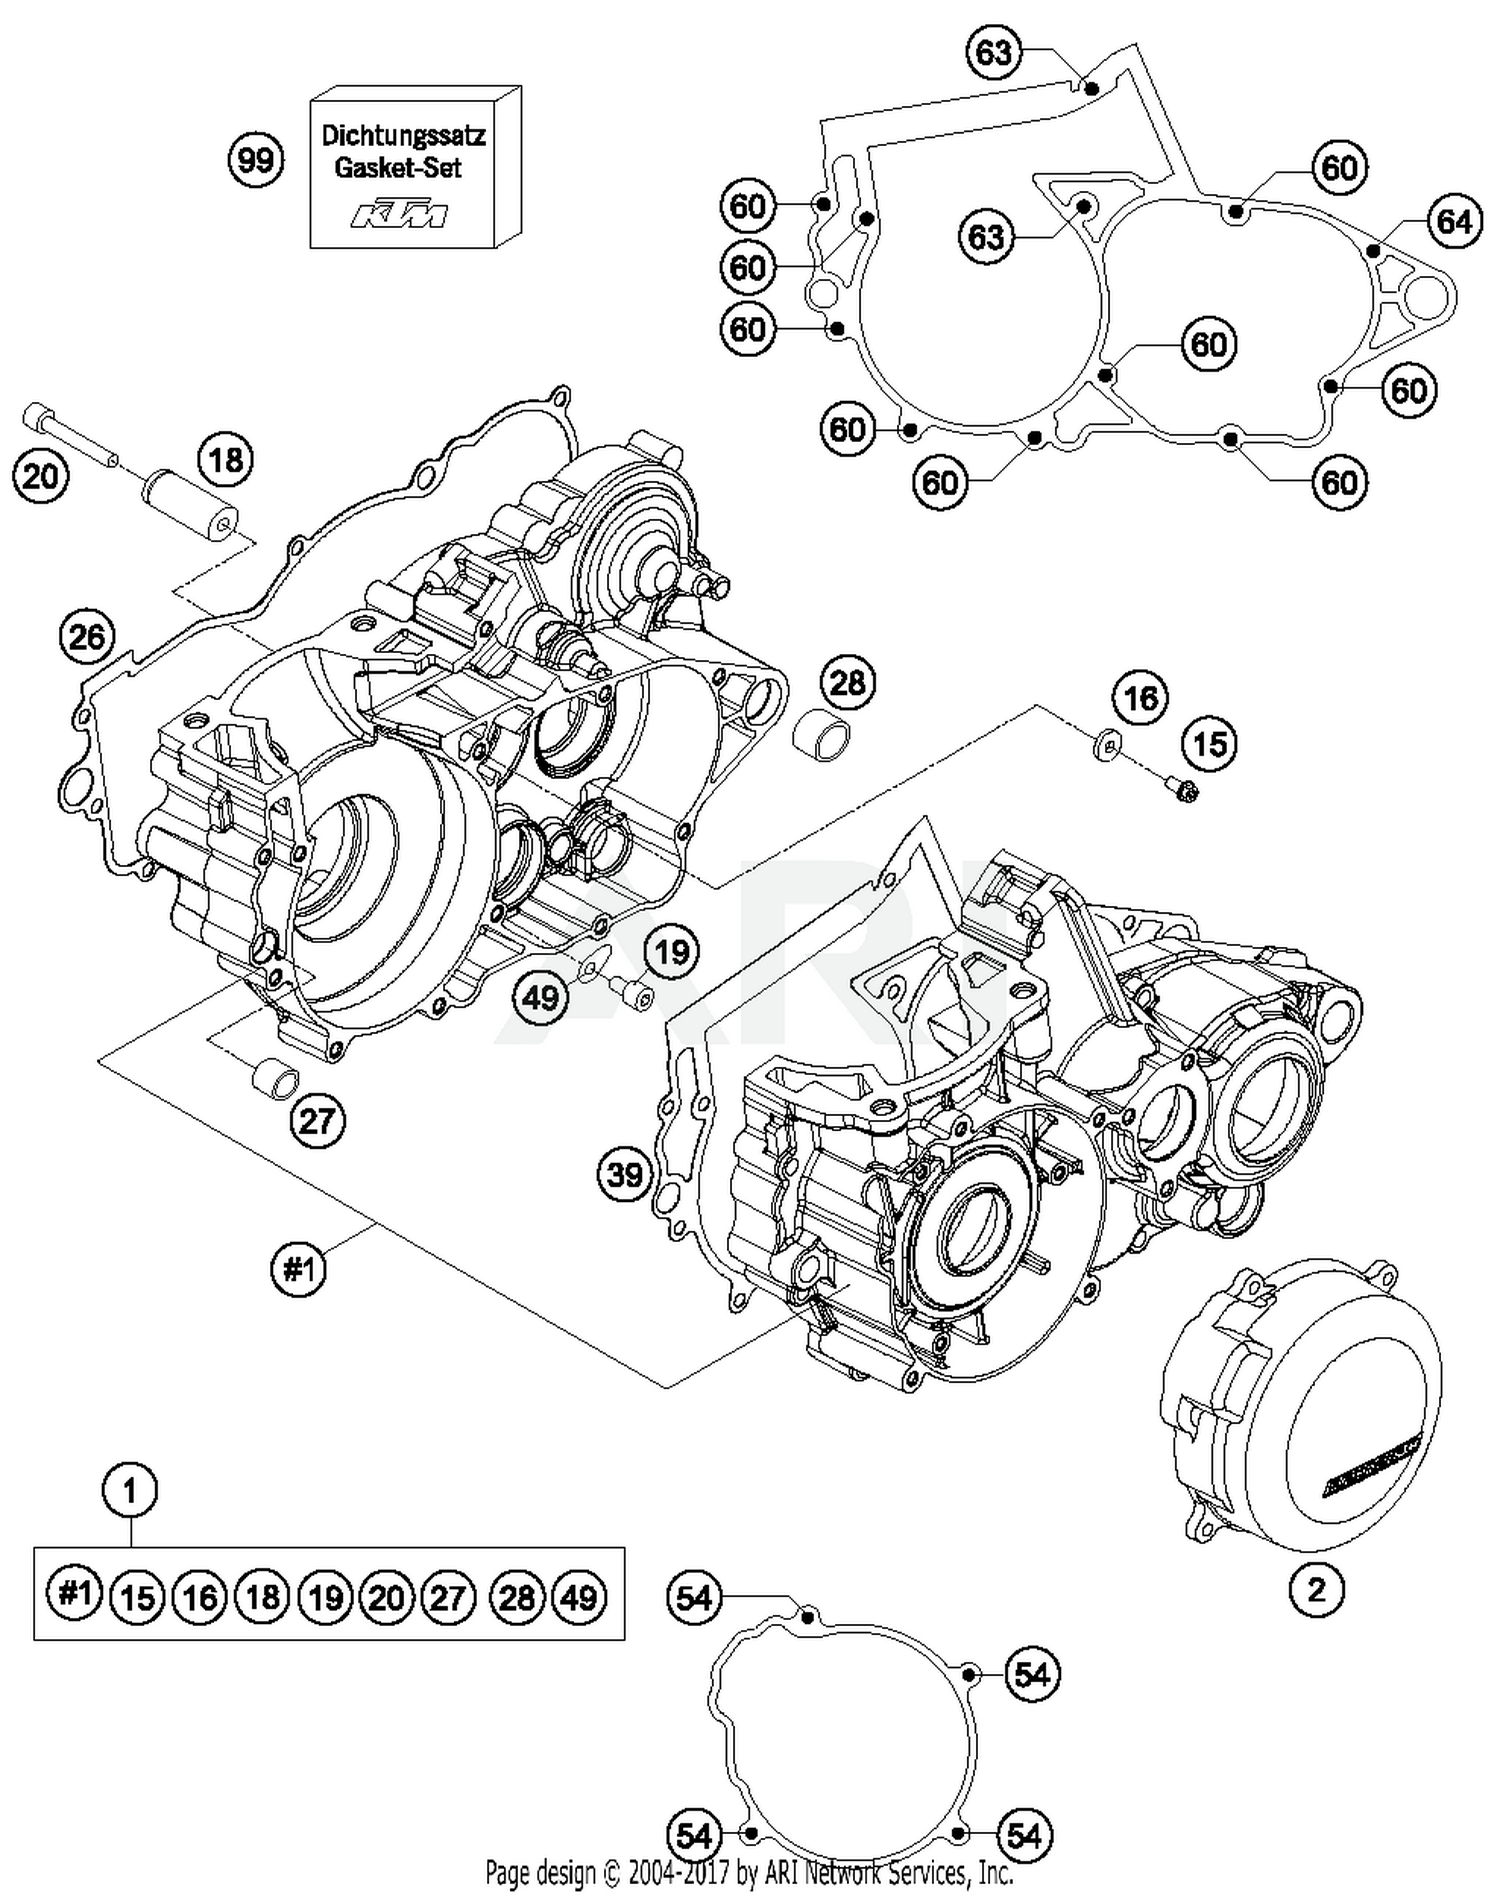 ktm engine schematics - universal wiring diagrams layout-website - layout -website.sceglicongusto.it  sceglicongusto.it